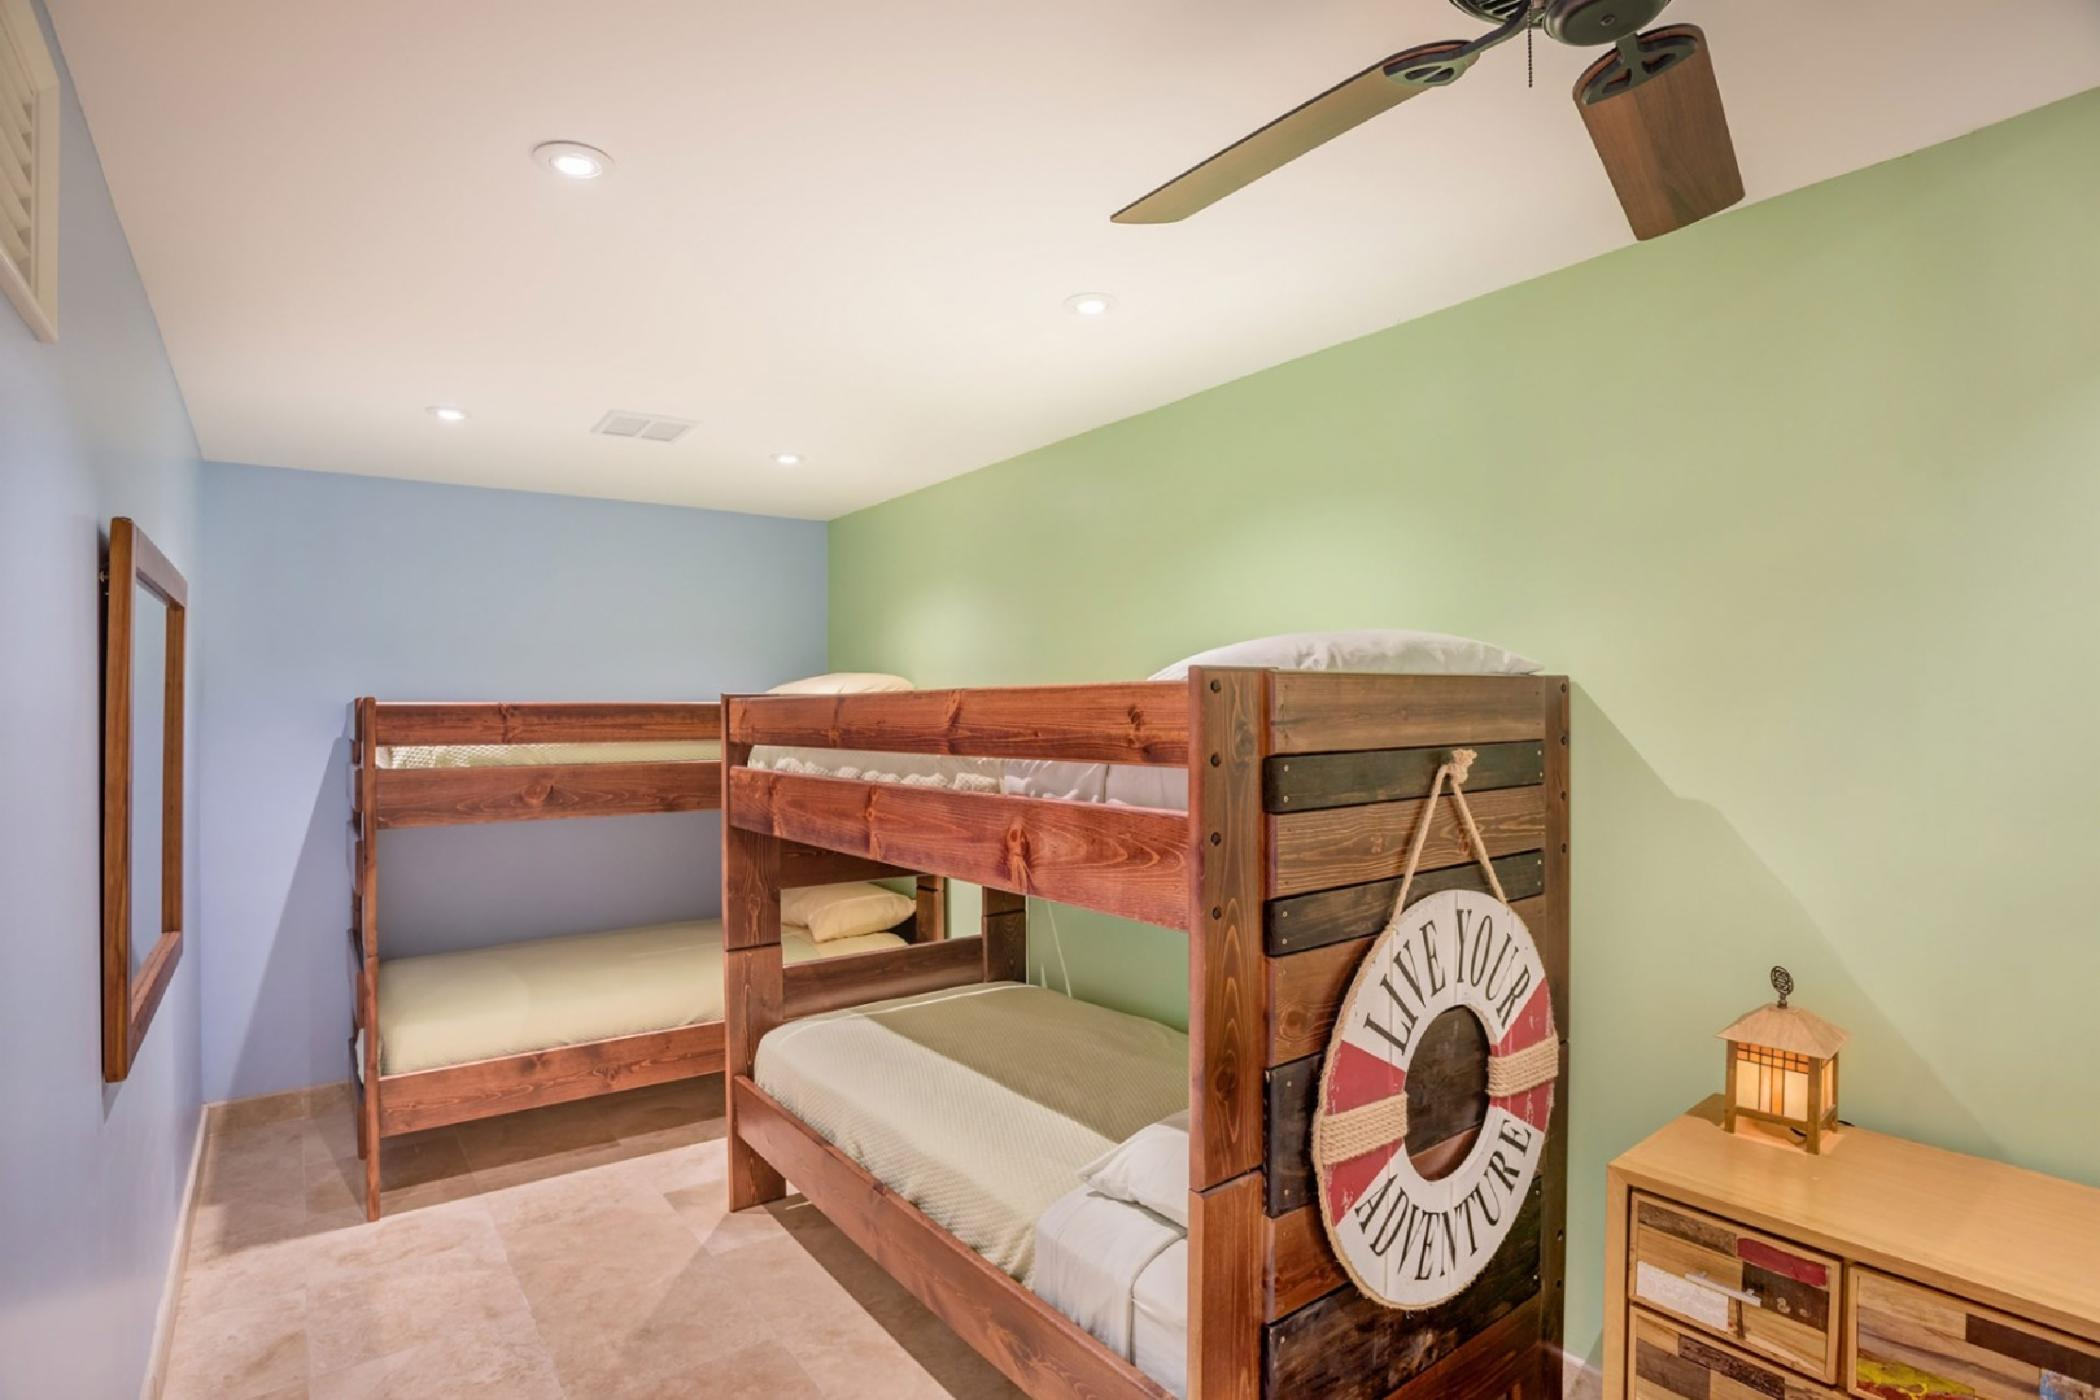 kaw-bunk-room.jpeg